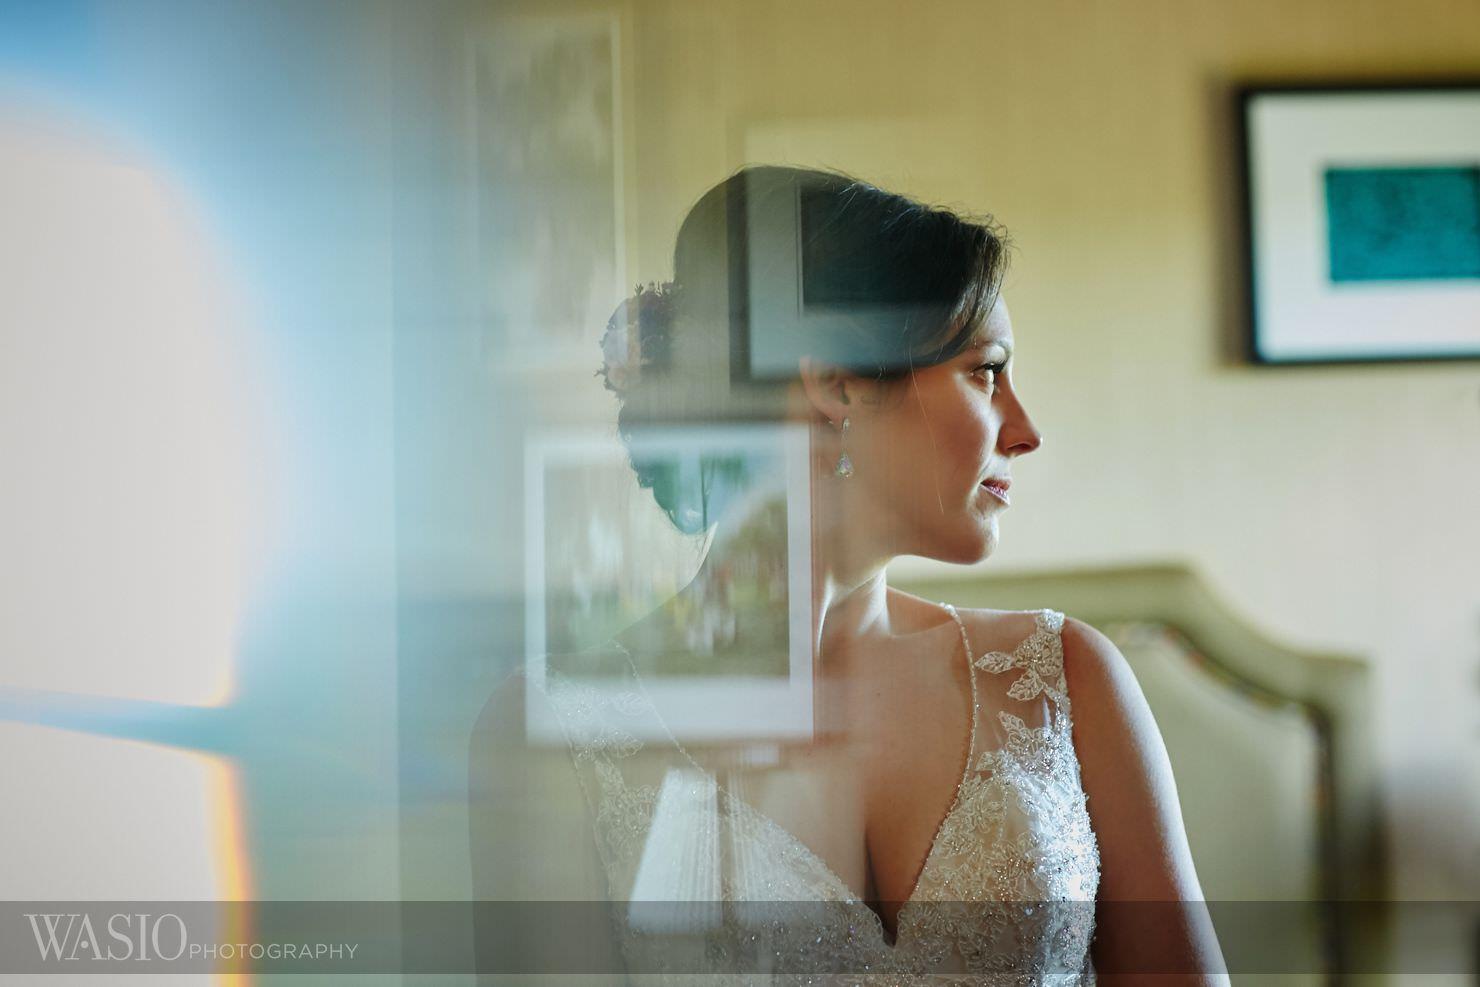 012_Lincoln-Park-Wedding_Dimphy-Mark__O3A9399 Lincoln Park Wedding - Dimphy & Mark